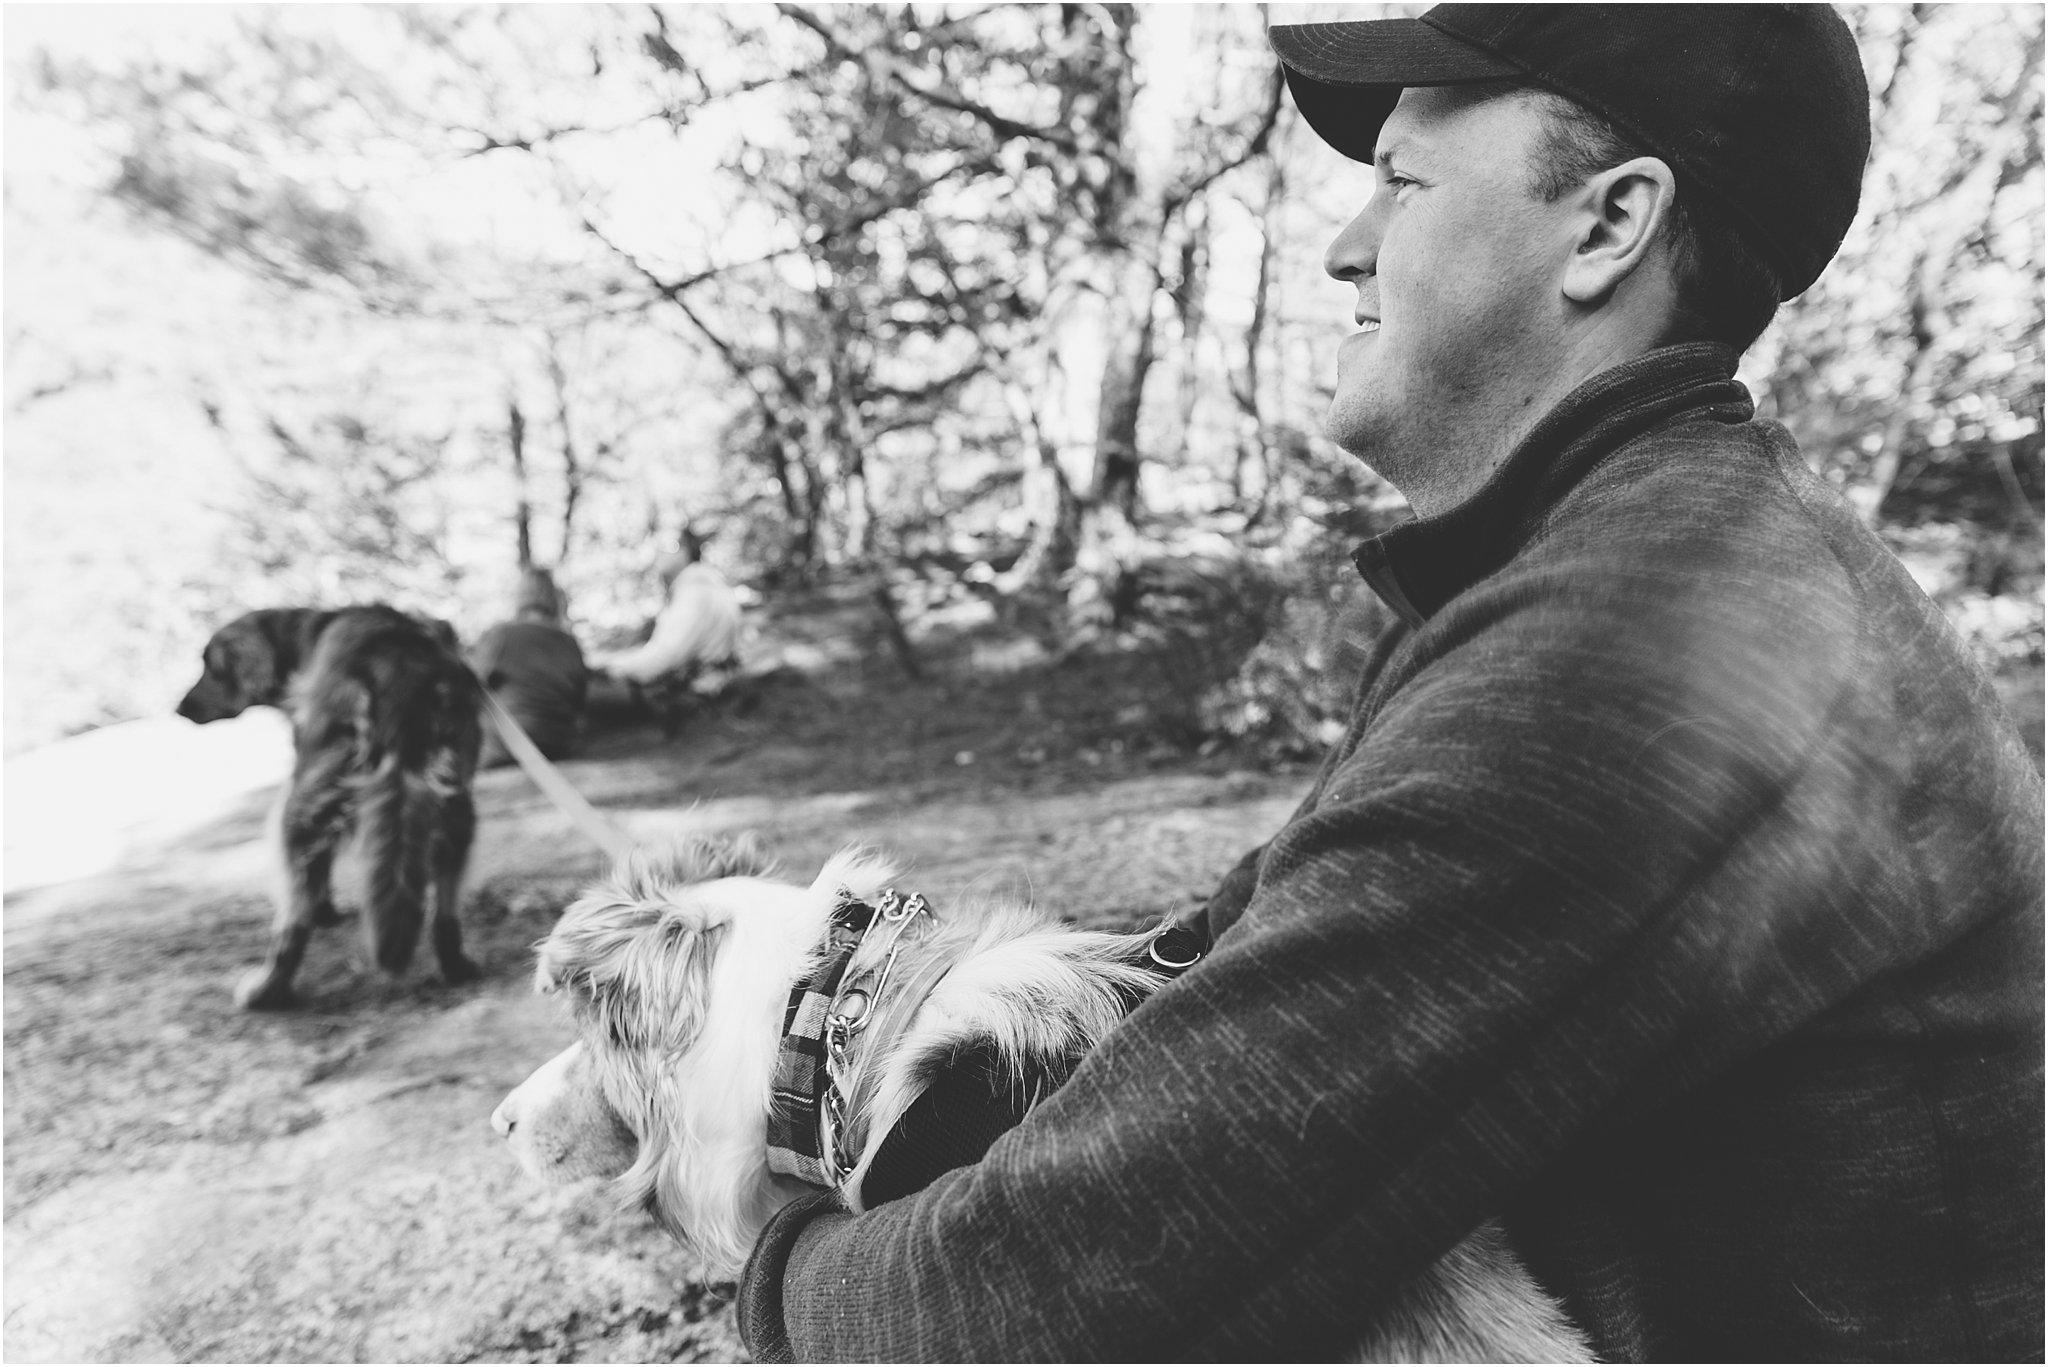 Wintergreen Resort Hiking Virginia crabtree falls hiking with dogs